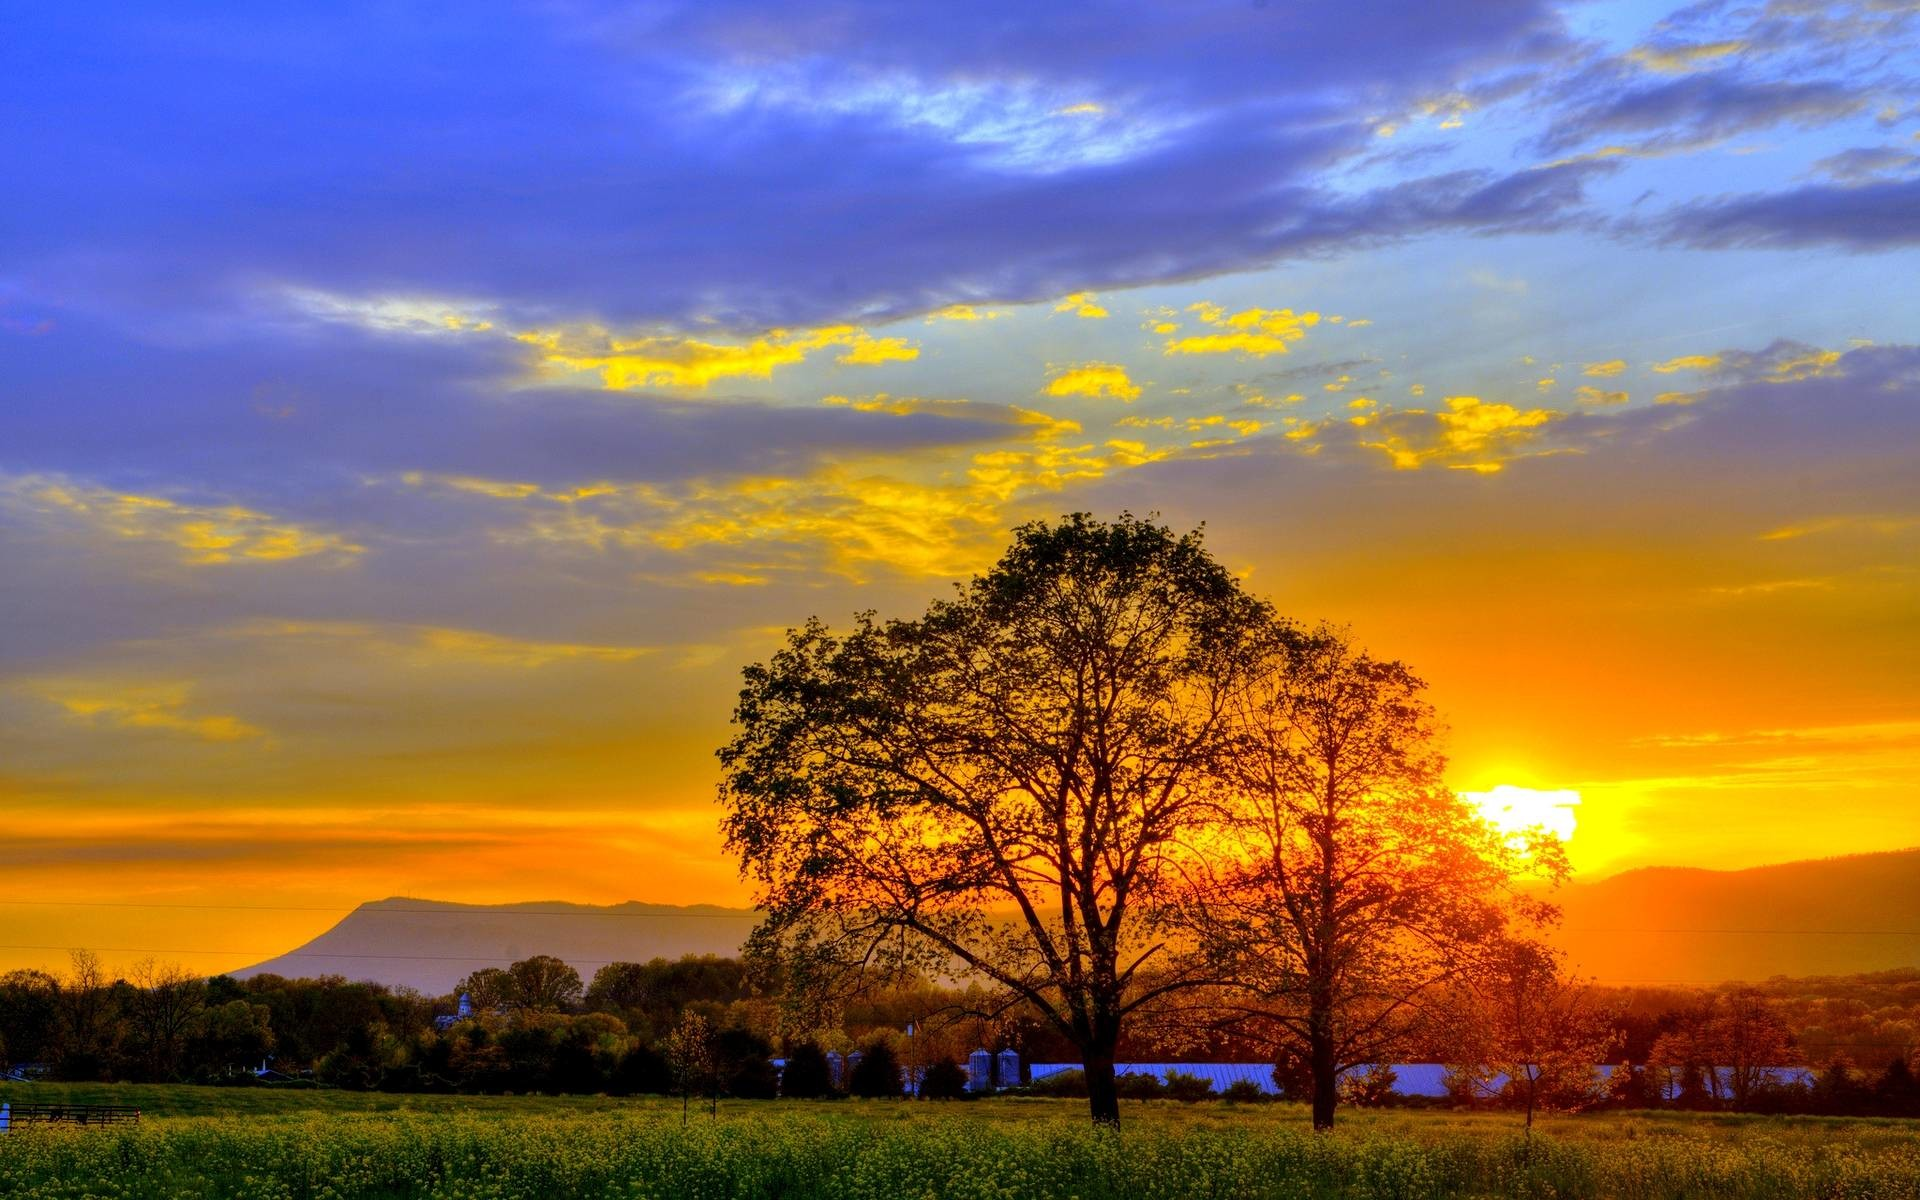 1920x1200 Summer Sunset Photography Hd 1080p 11 Hd Nature Sunset Background Hd 1920x1200 Wallpaper Teahub Io